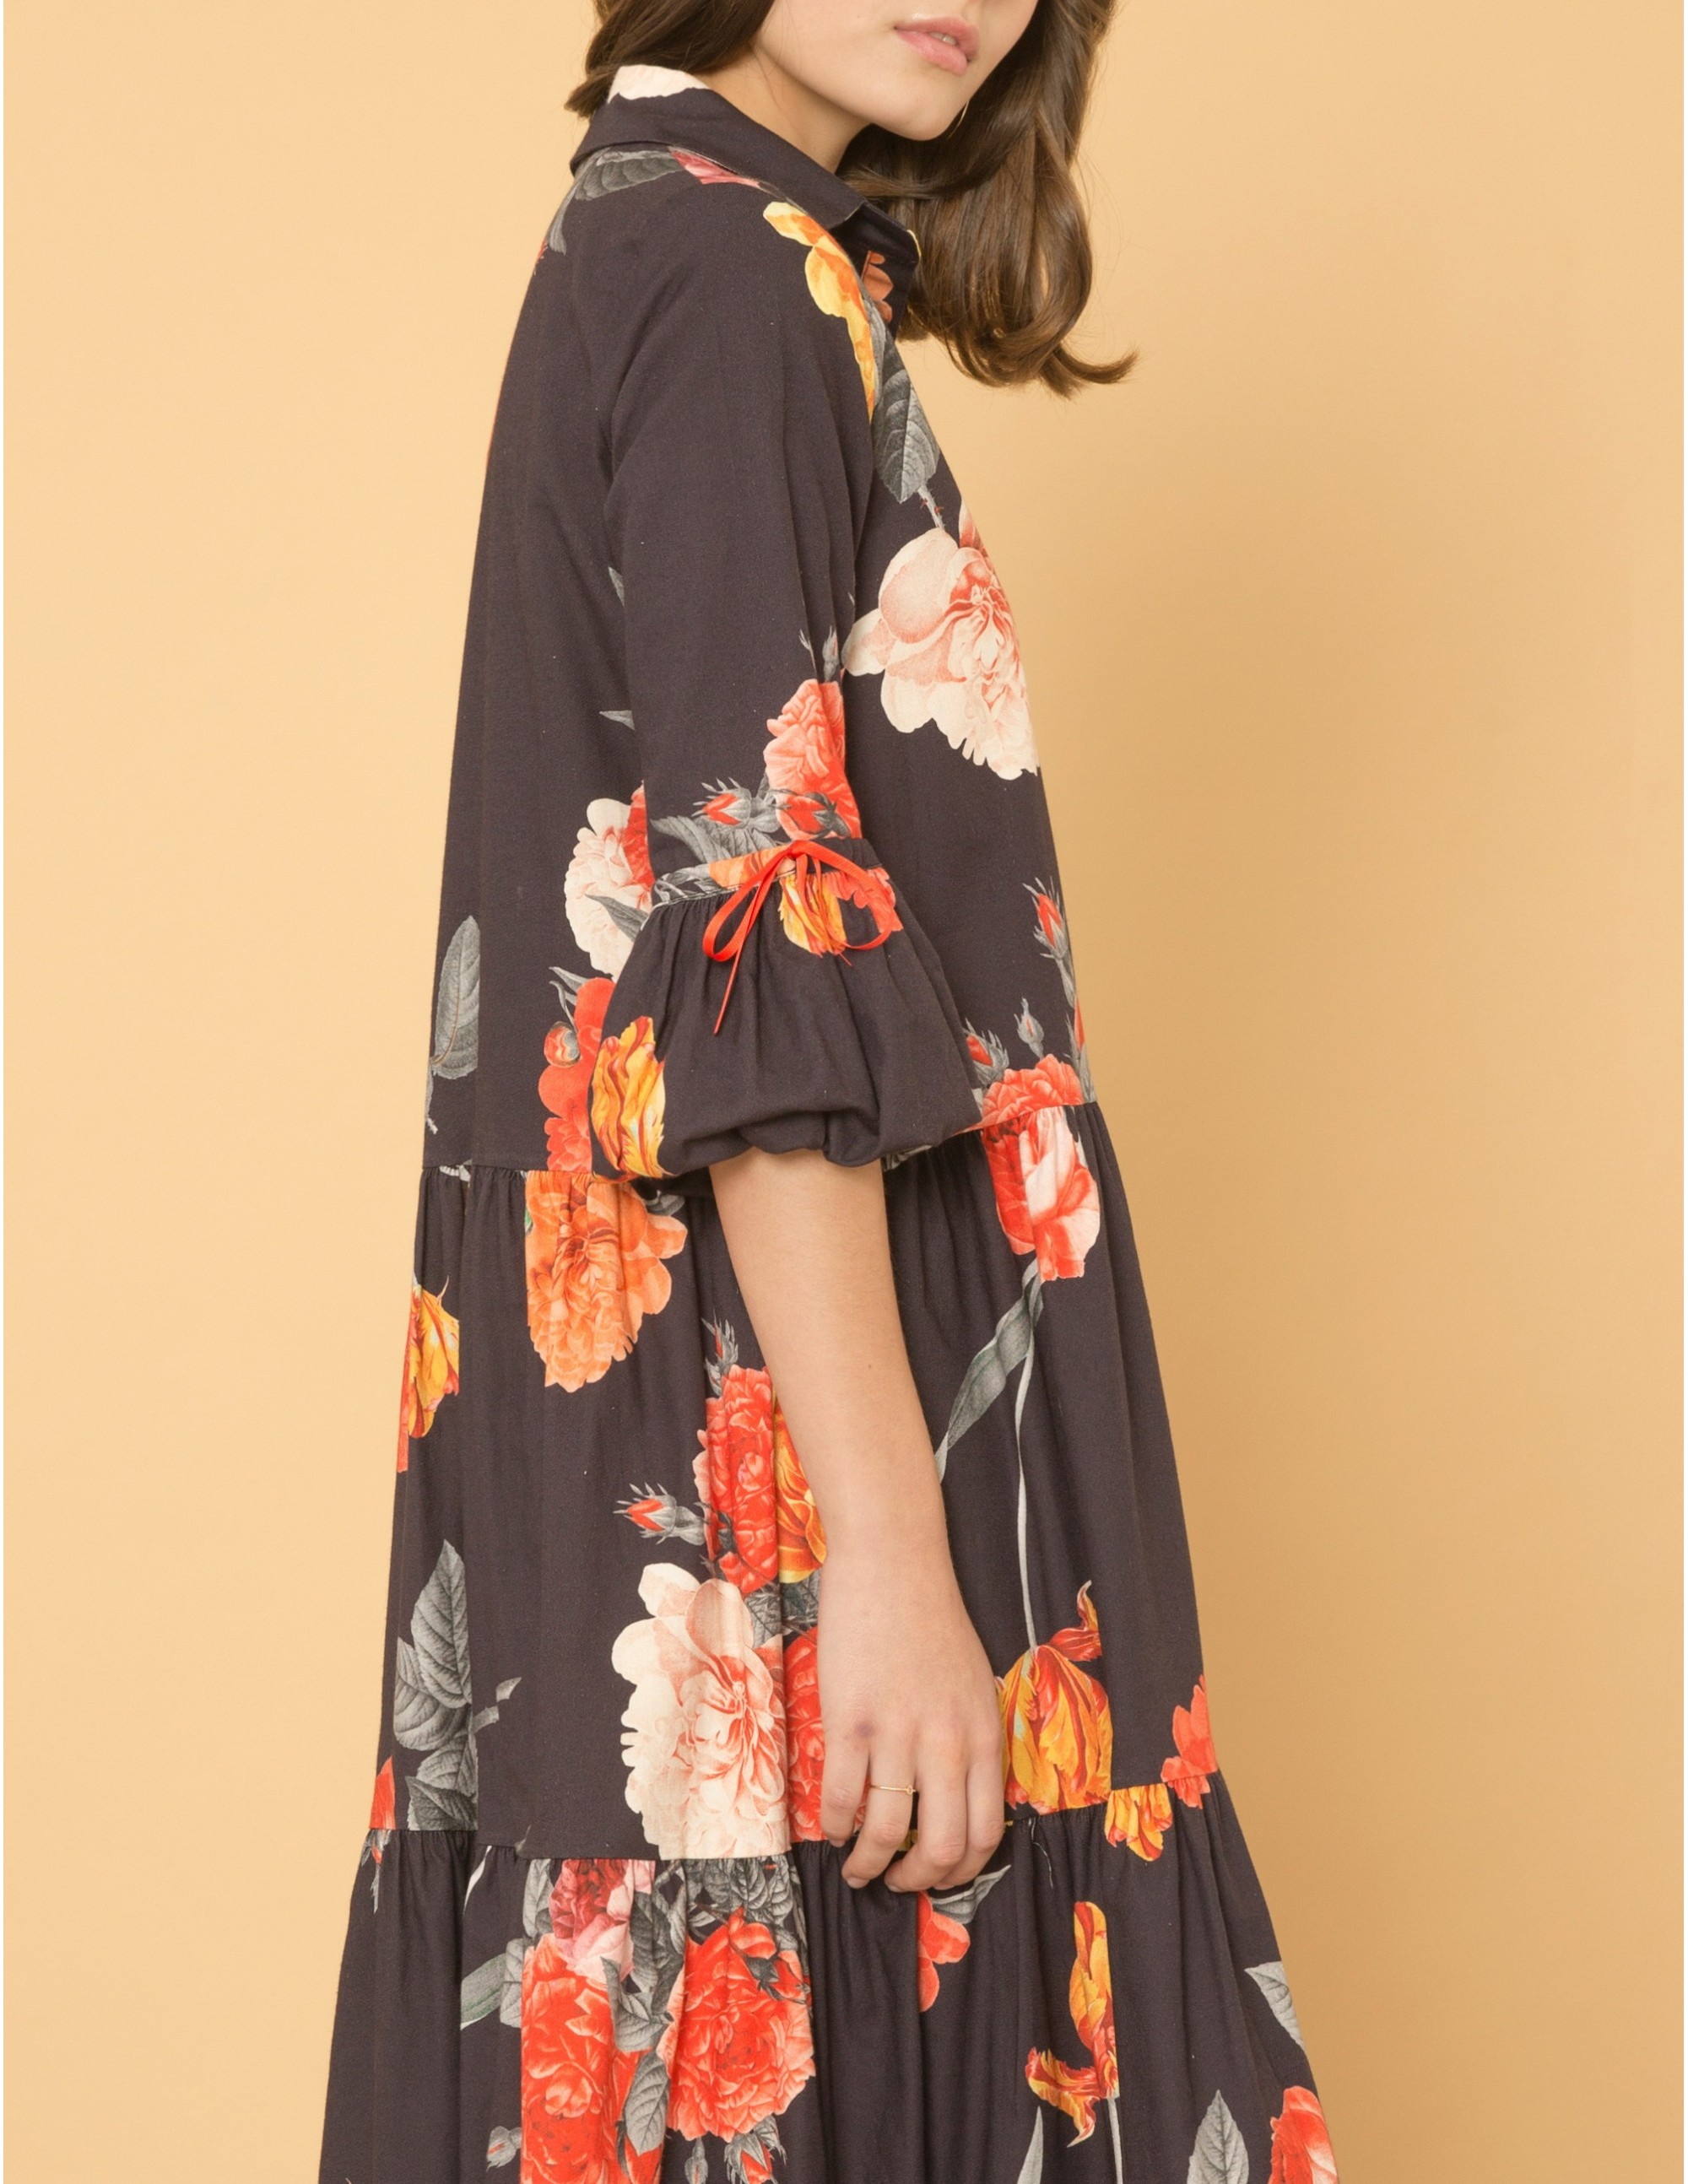 ATTRACTION Dress - SECRET GARDEN